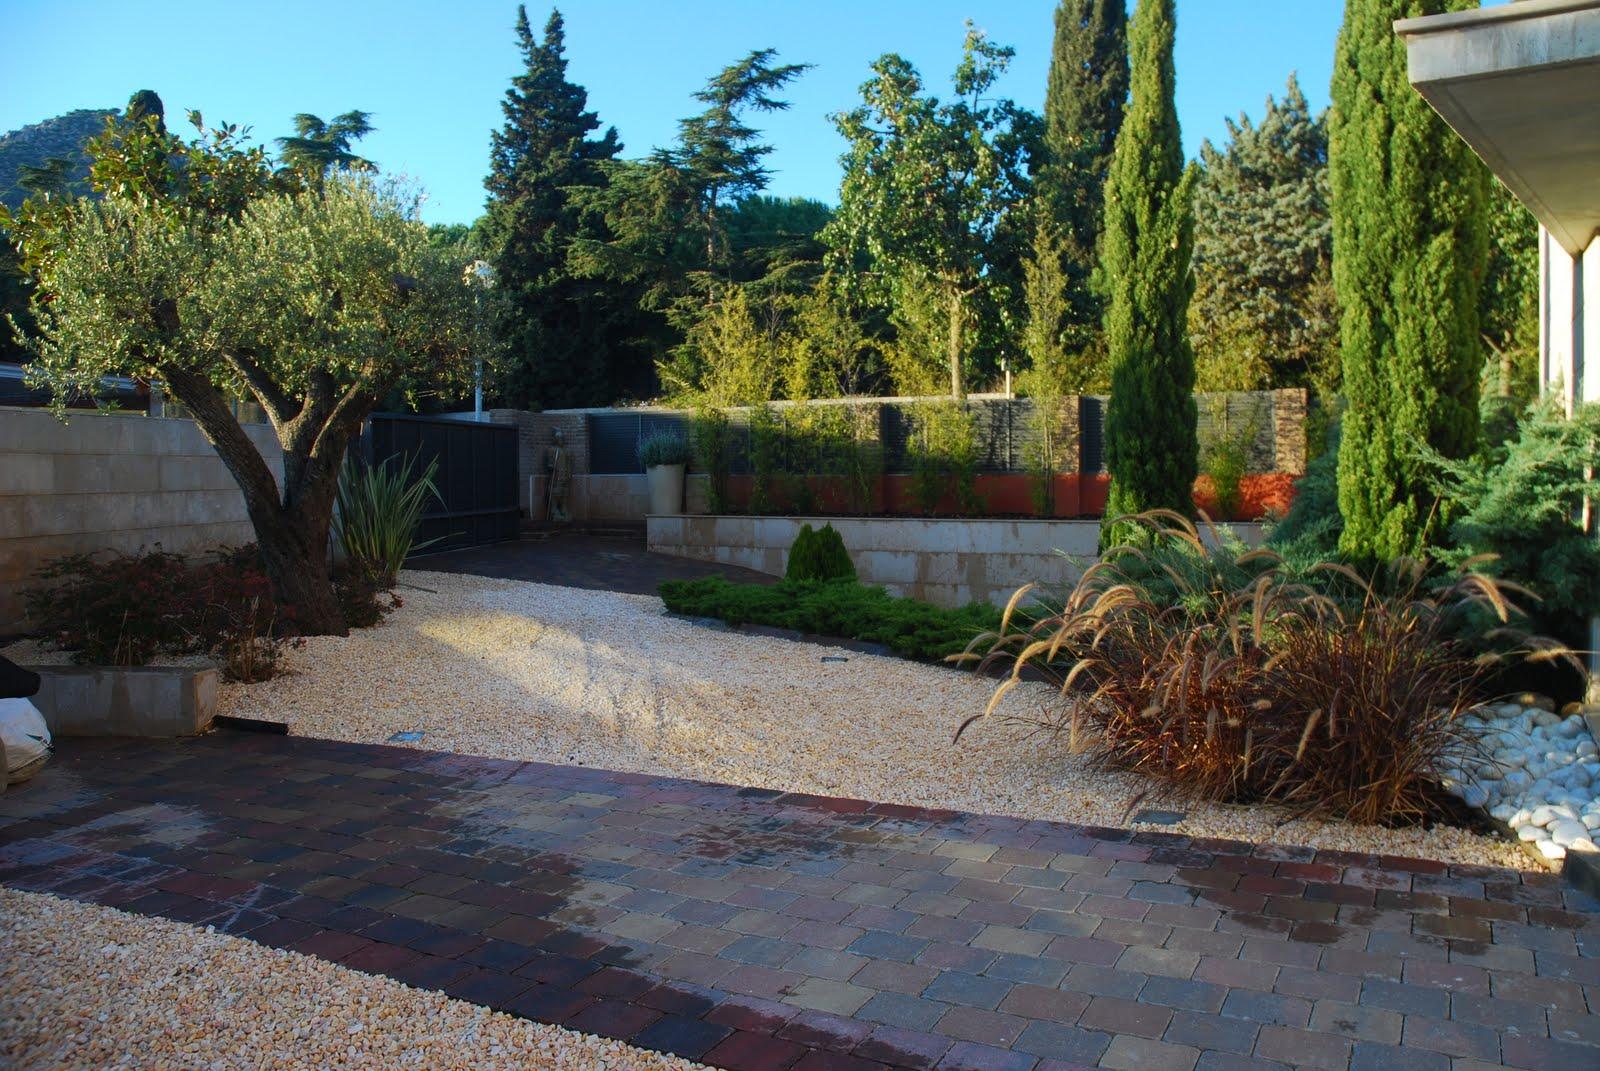 Jardin moderno jardin moderno mediterraneo for M jardins miniac morvan